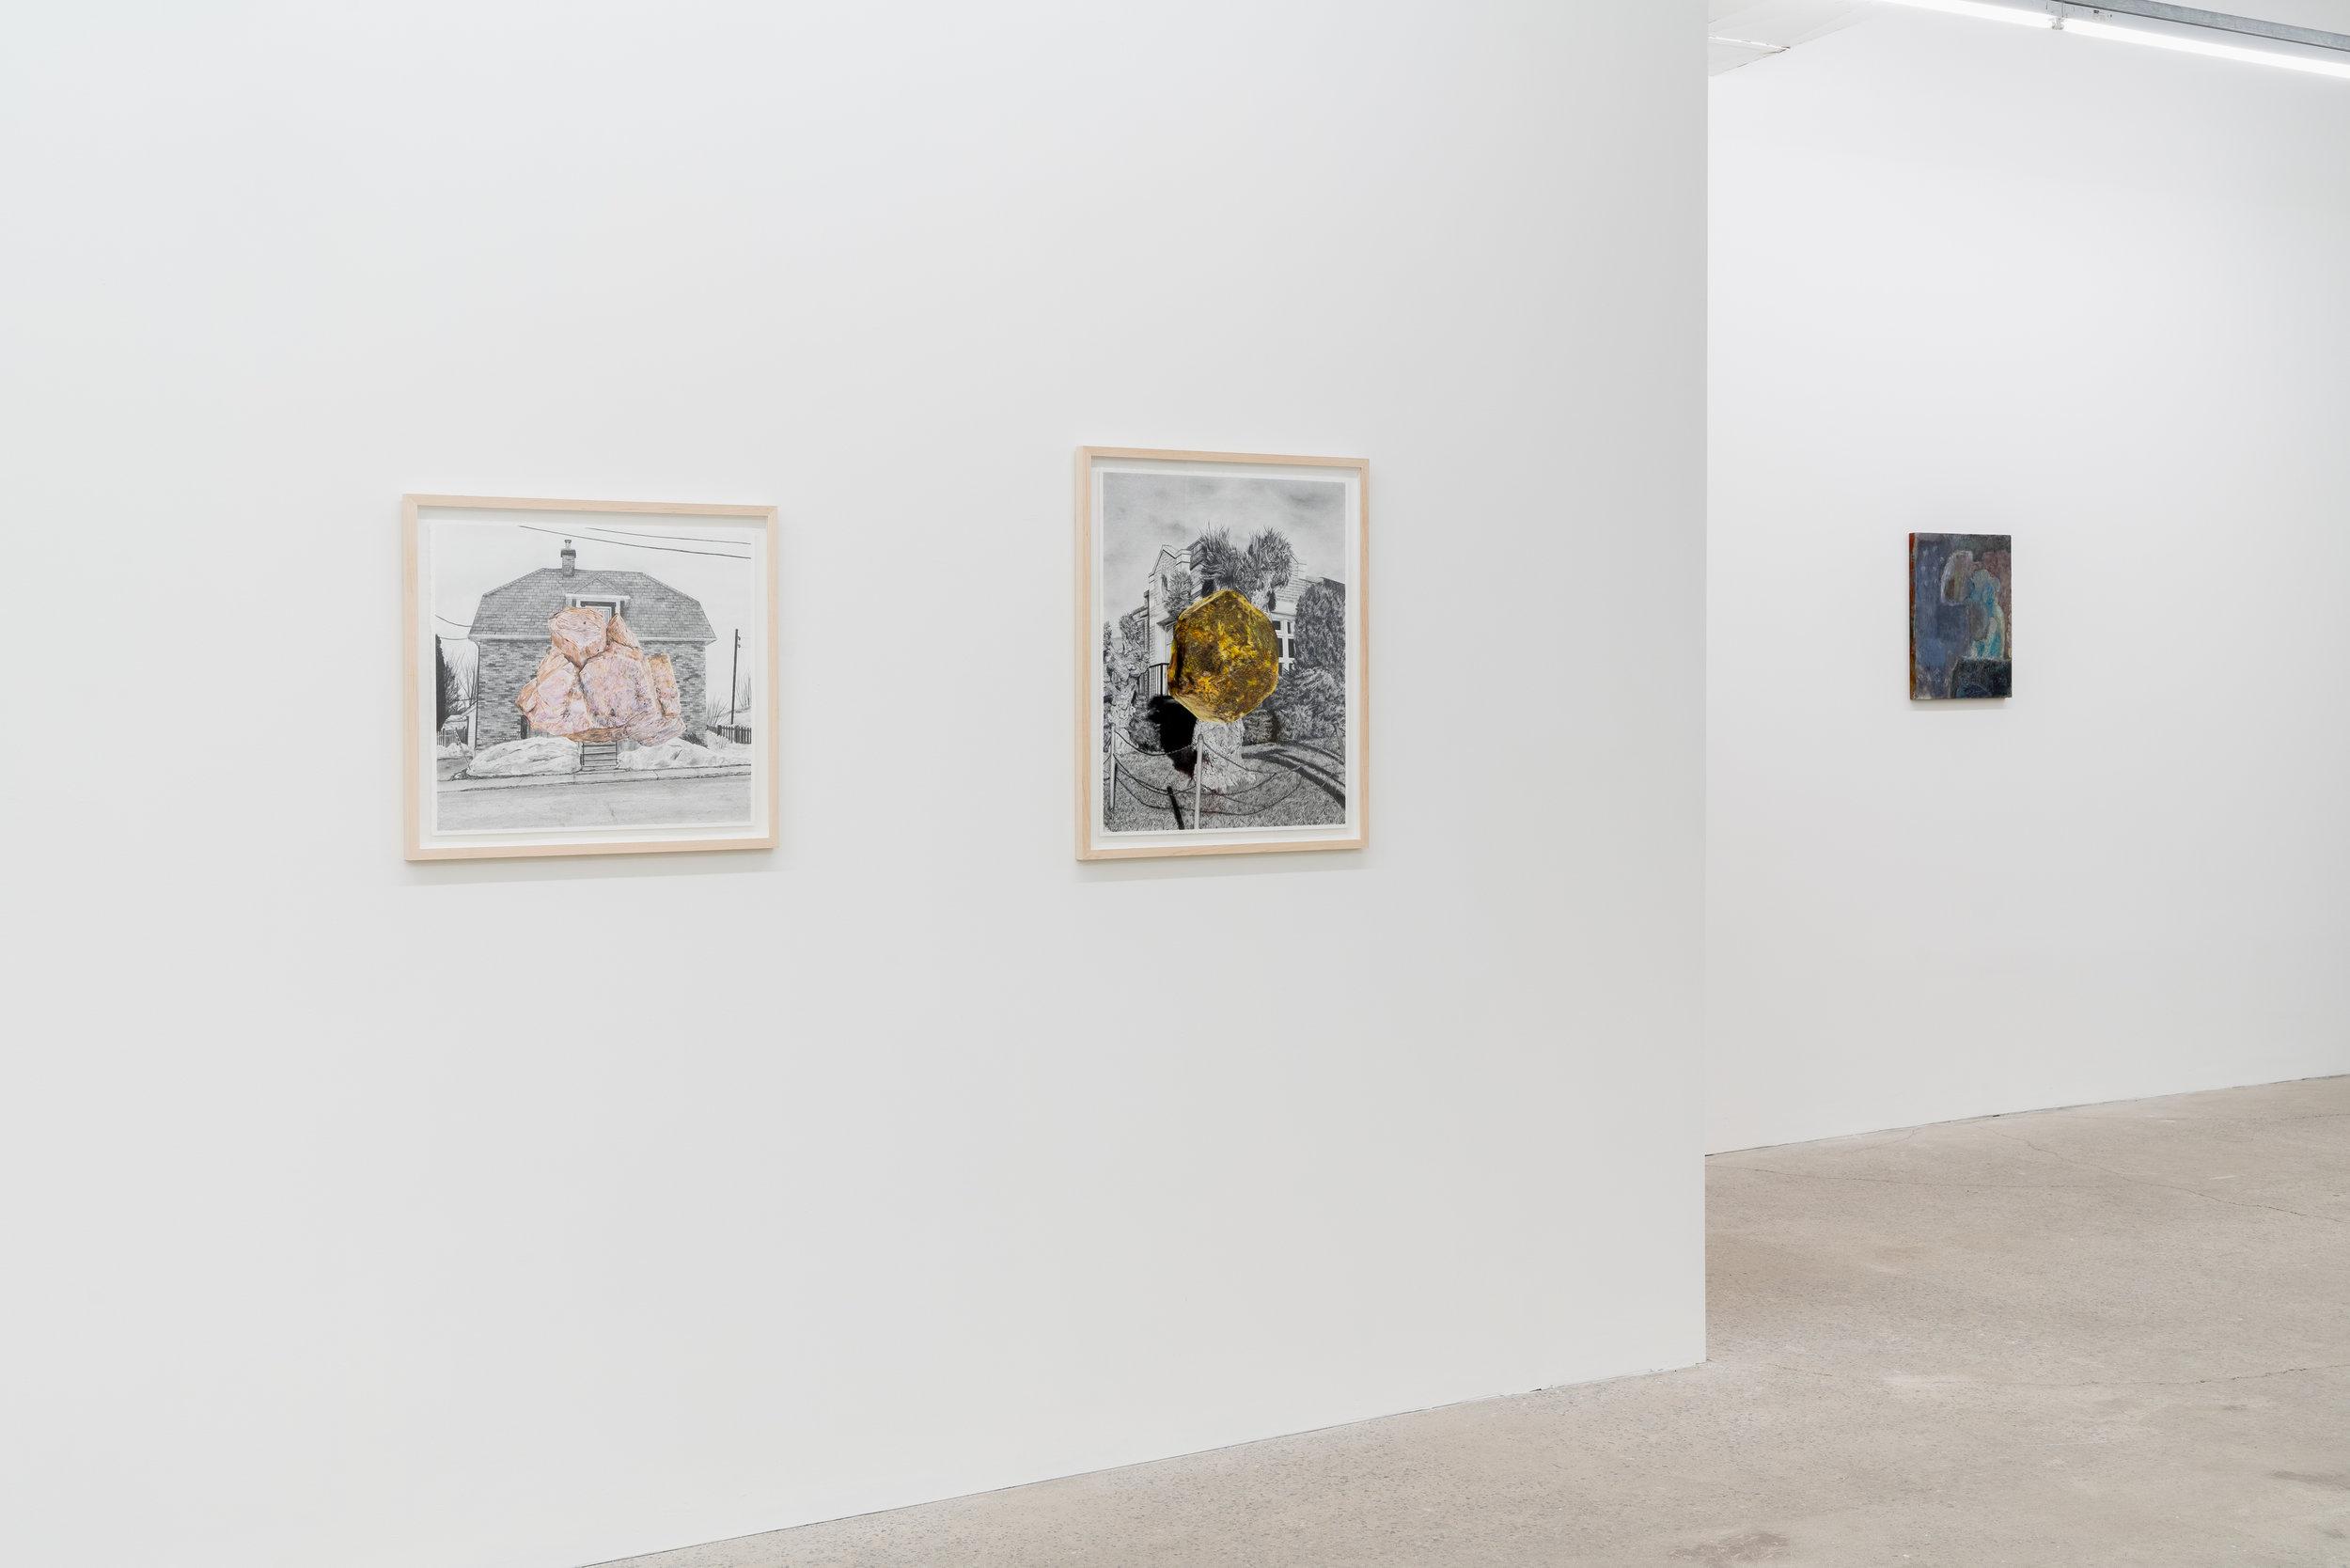 GalerieNicolasRobertNovembre2018 (27 of 27).jpg